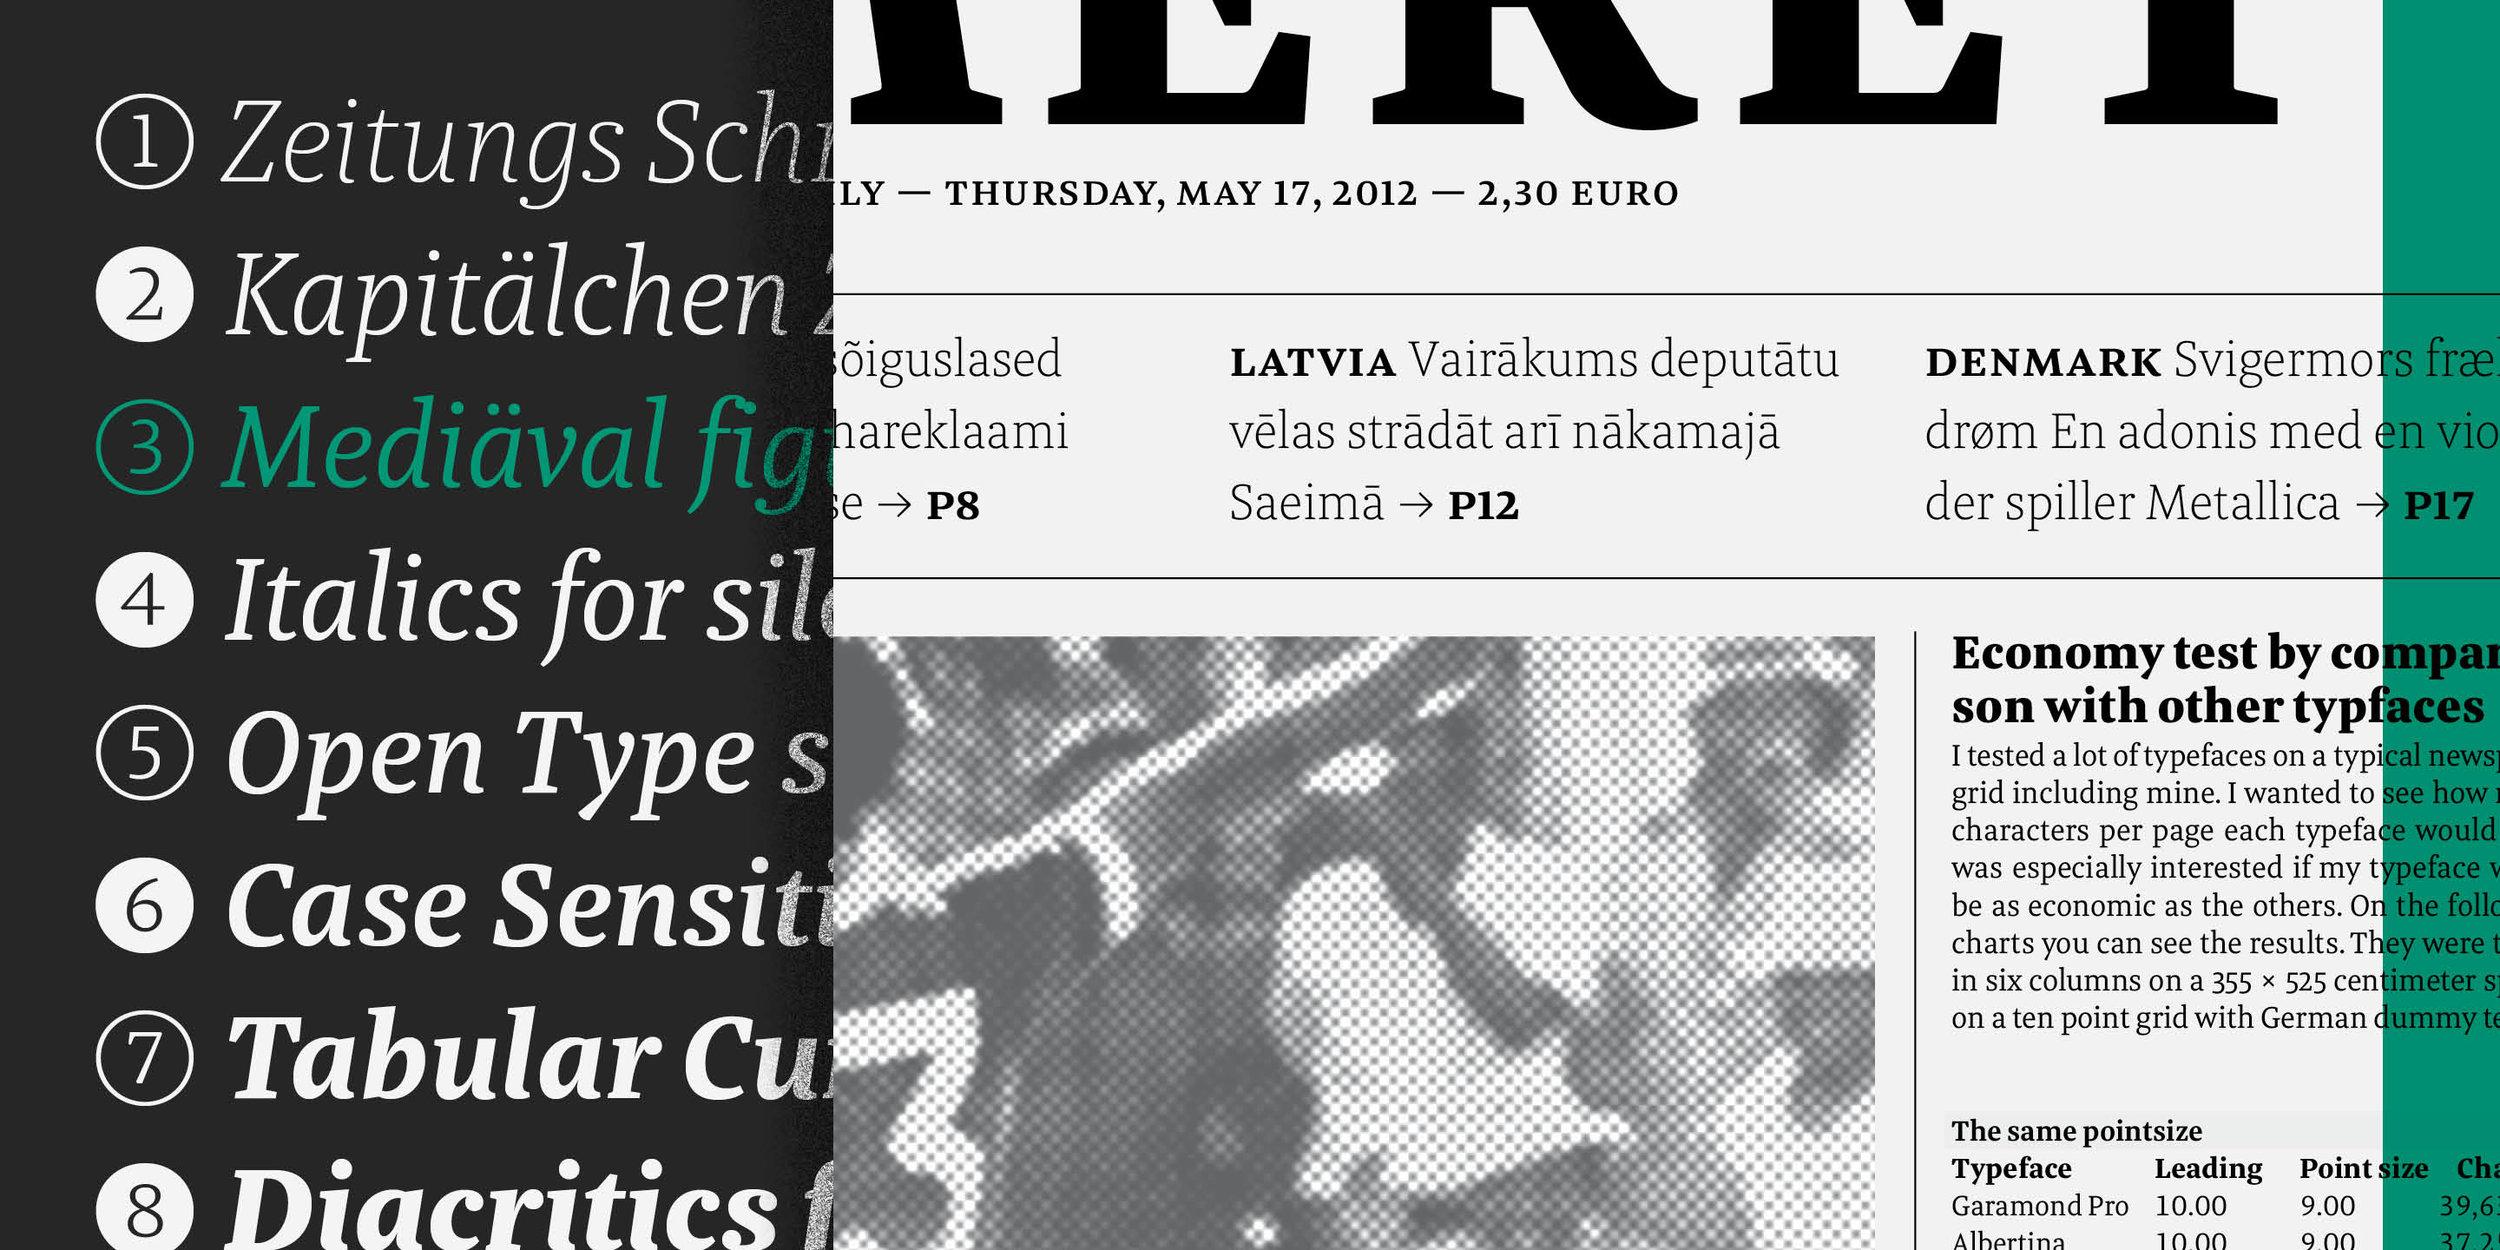 MeretPro-TypeMates-newspaper-editorial-typeface-font-2018-5.jpg